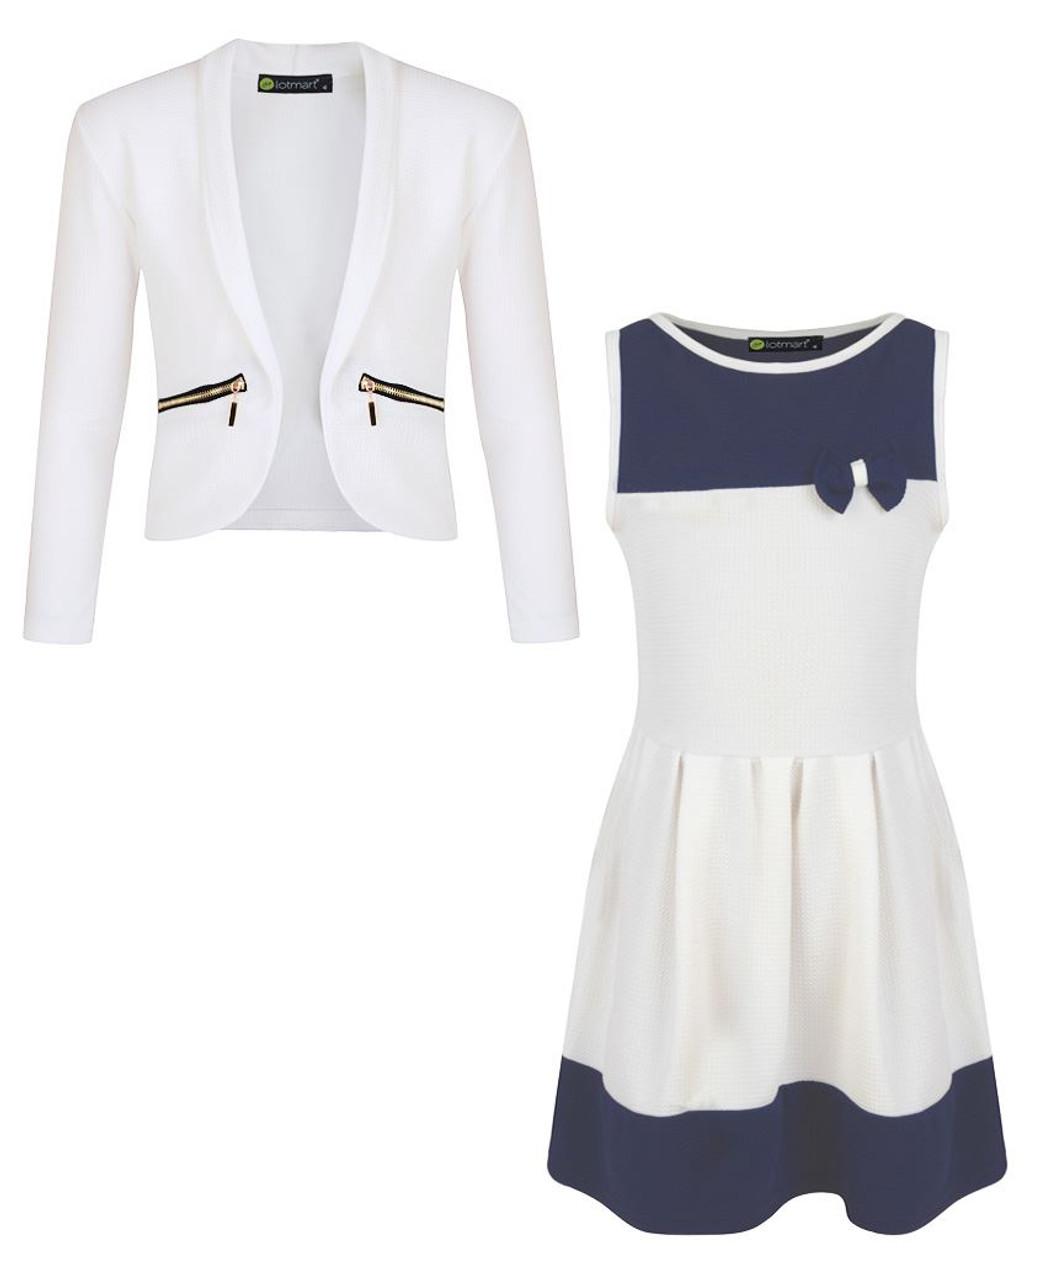 Girls Bow Dress Navy